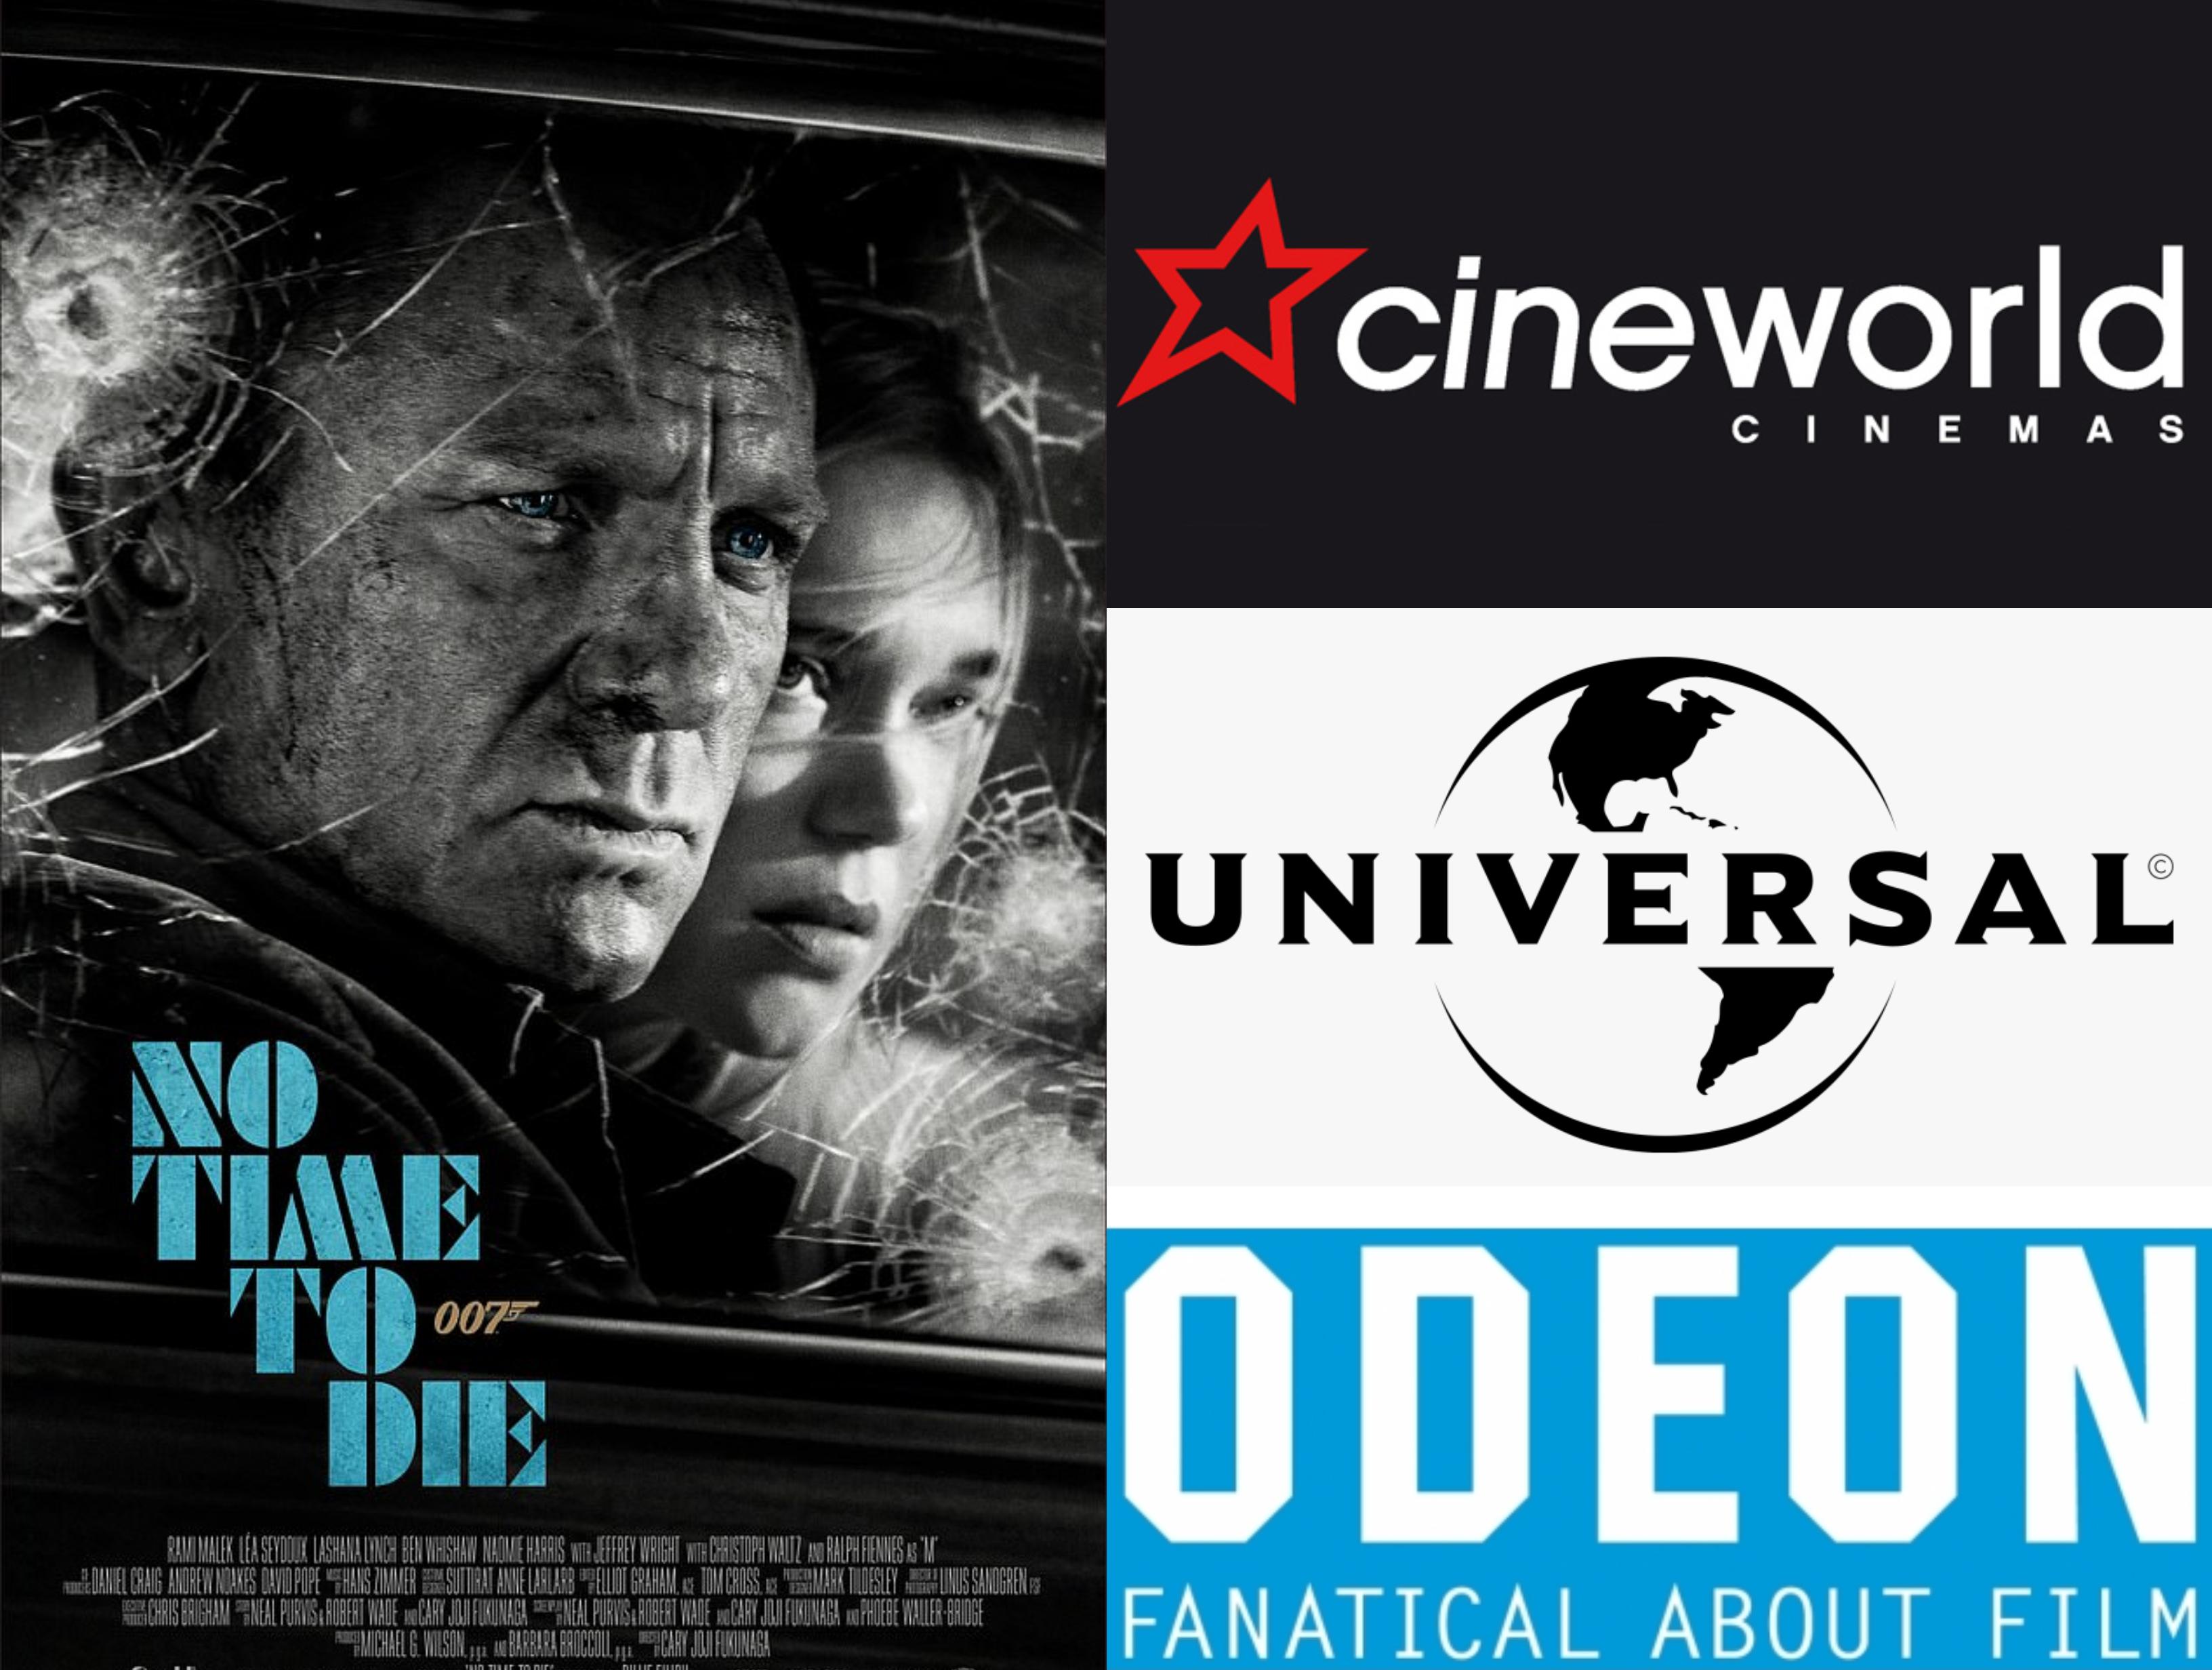 Cinewworld Universal Odeon